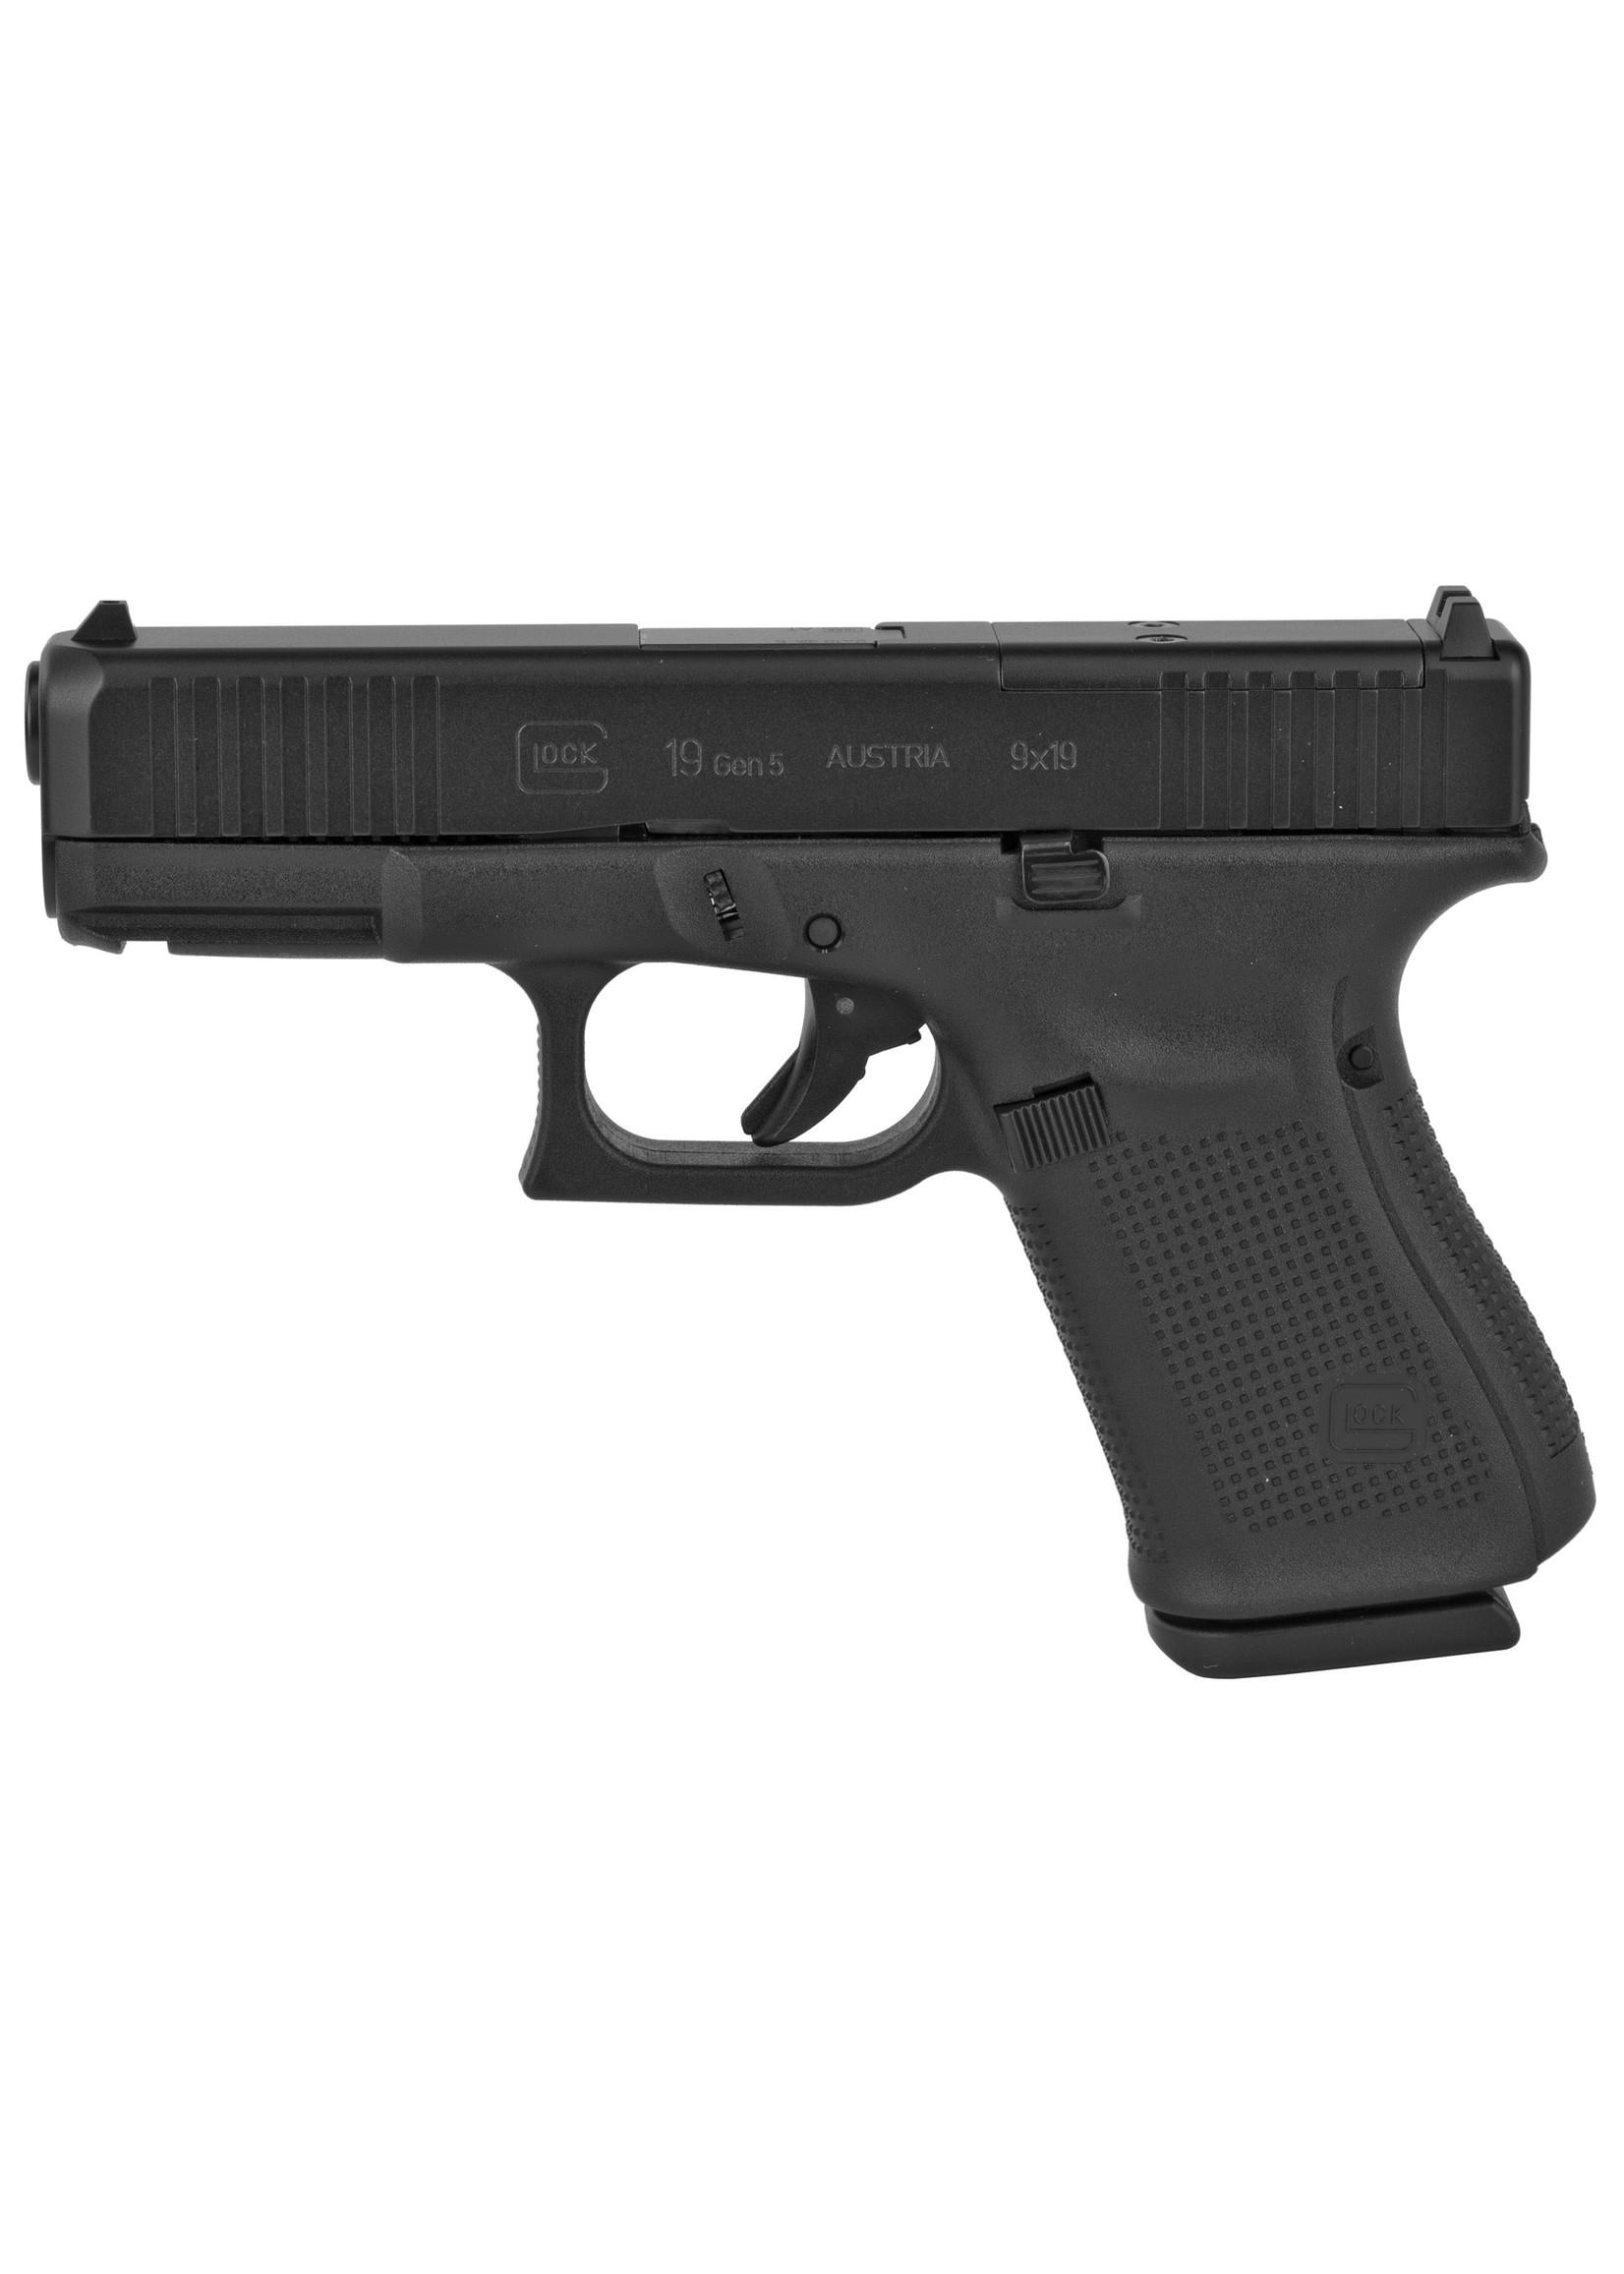 "Glock Glock 19 G5 MOS, 9MM, 4.02"" Marksman Barrel, Polymer Frame, Matte Finish, Fixed Sights, 15Rd, 3 Magazines"